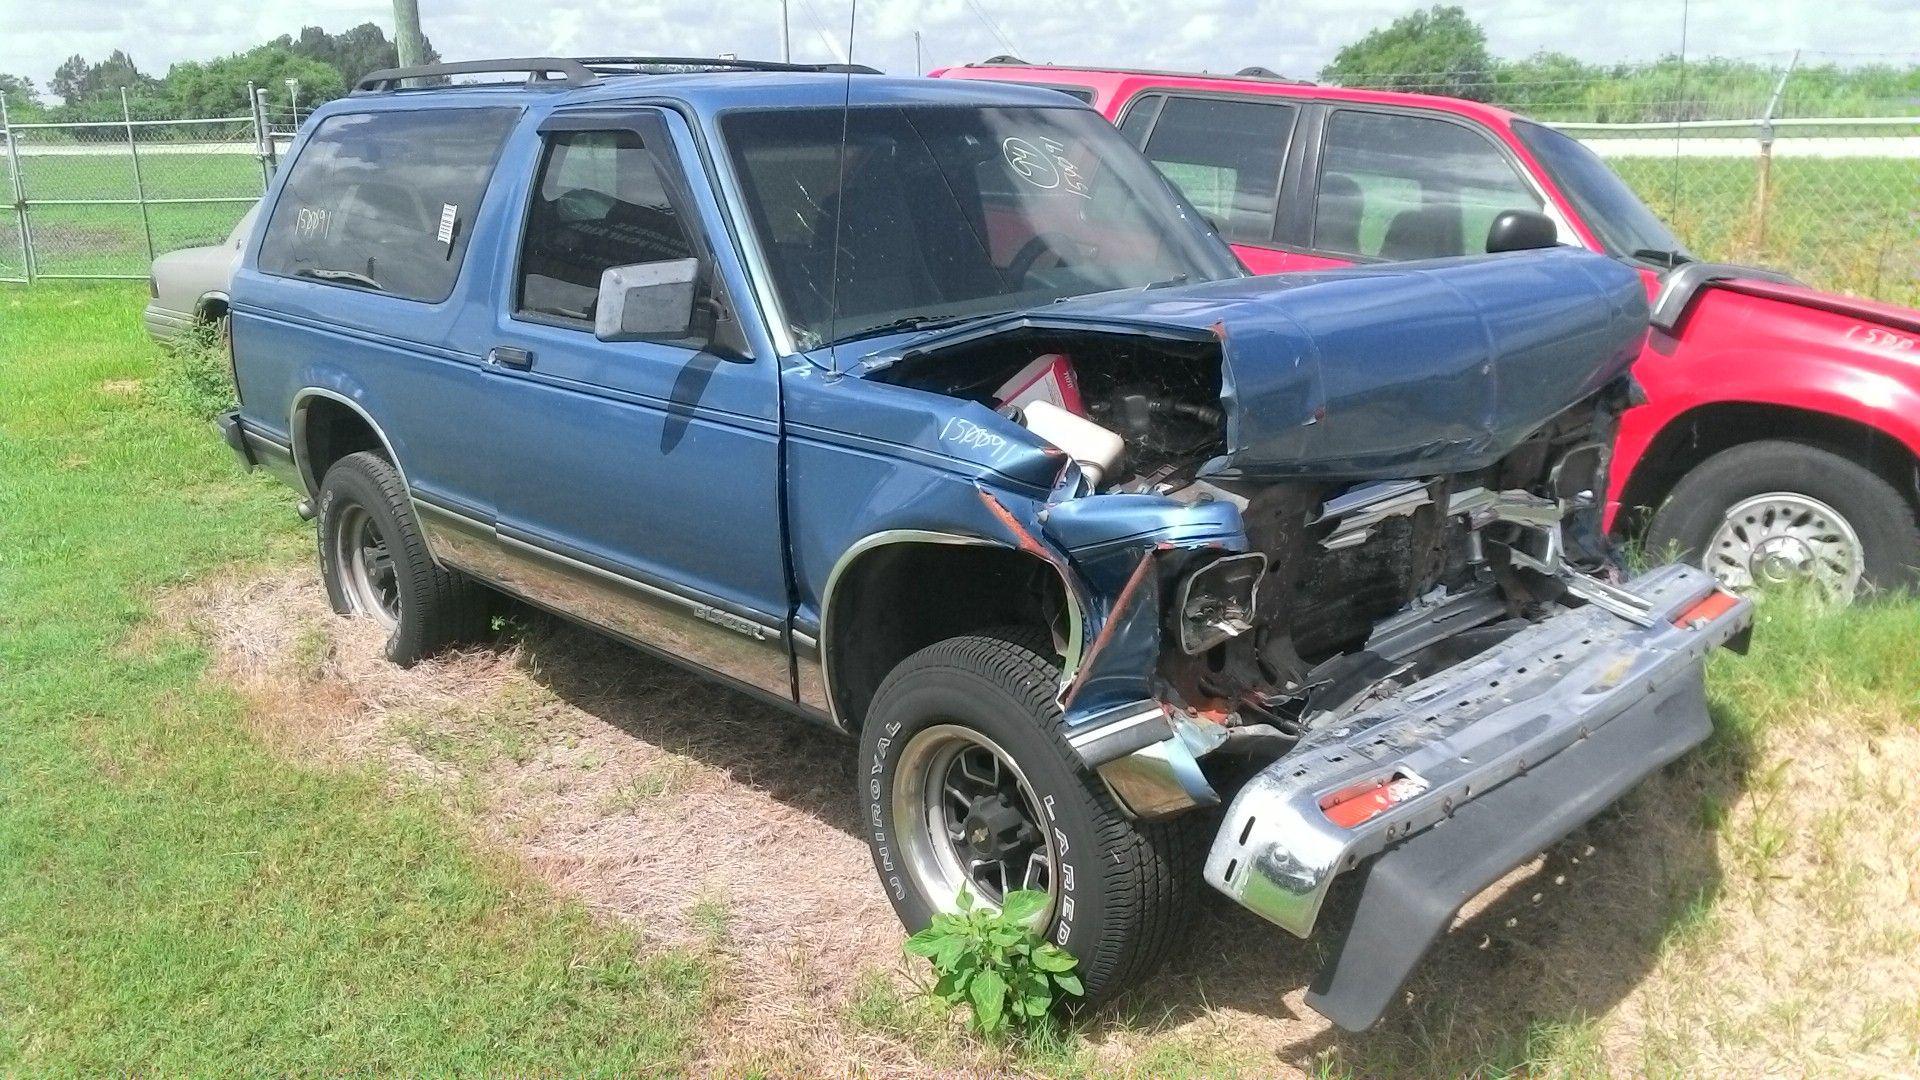 Chevrolet Blazer S10/Jimmy S15 Back Glass | Used SUV Parts